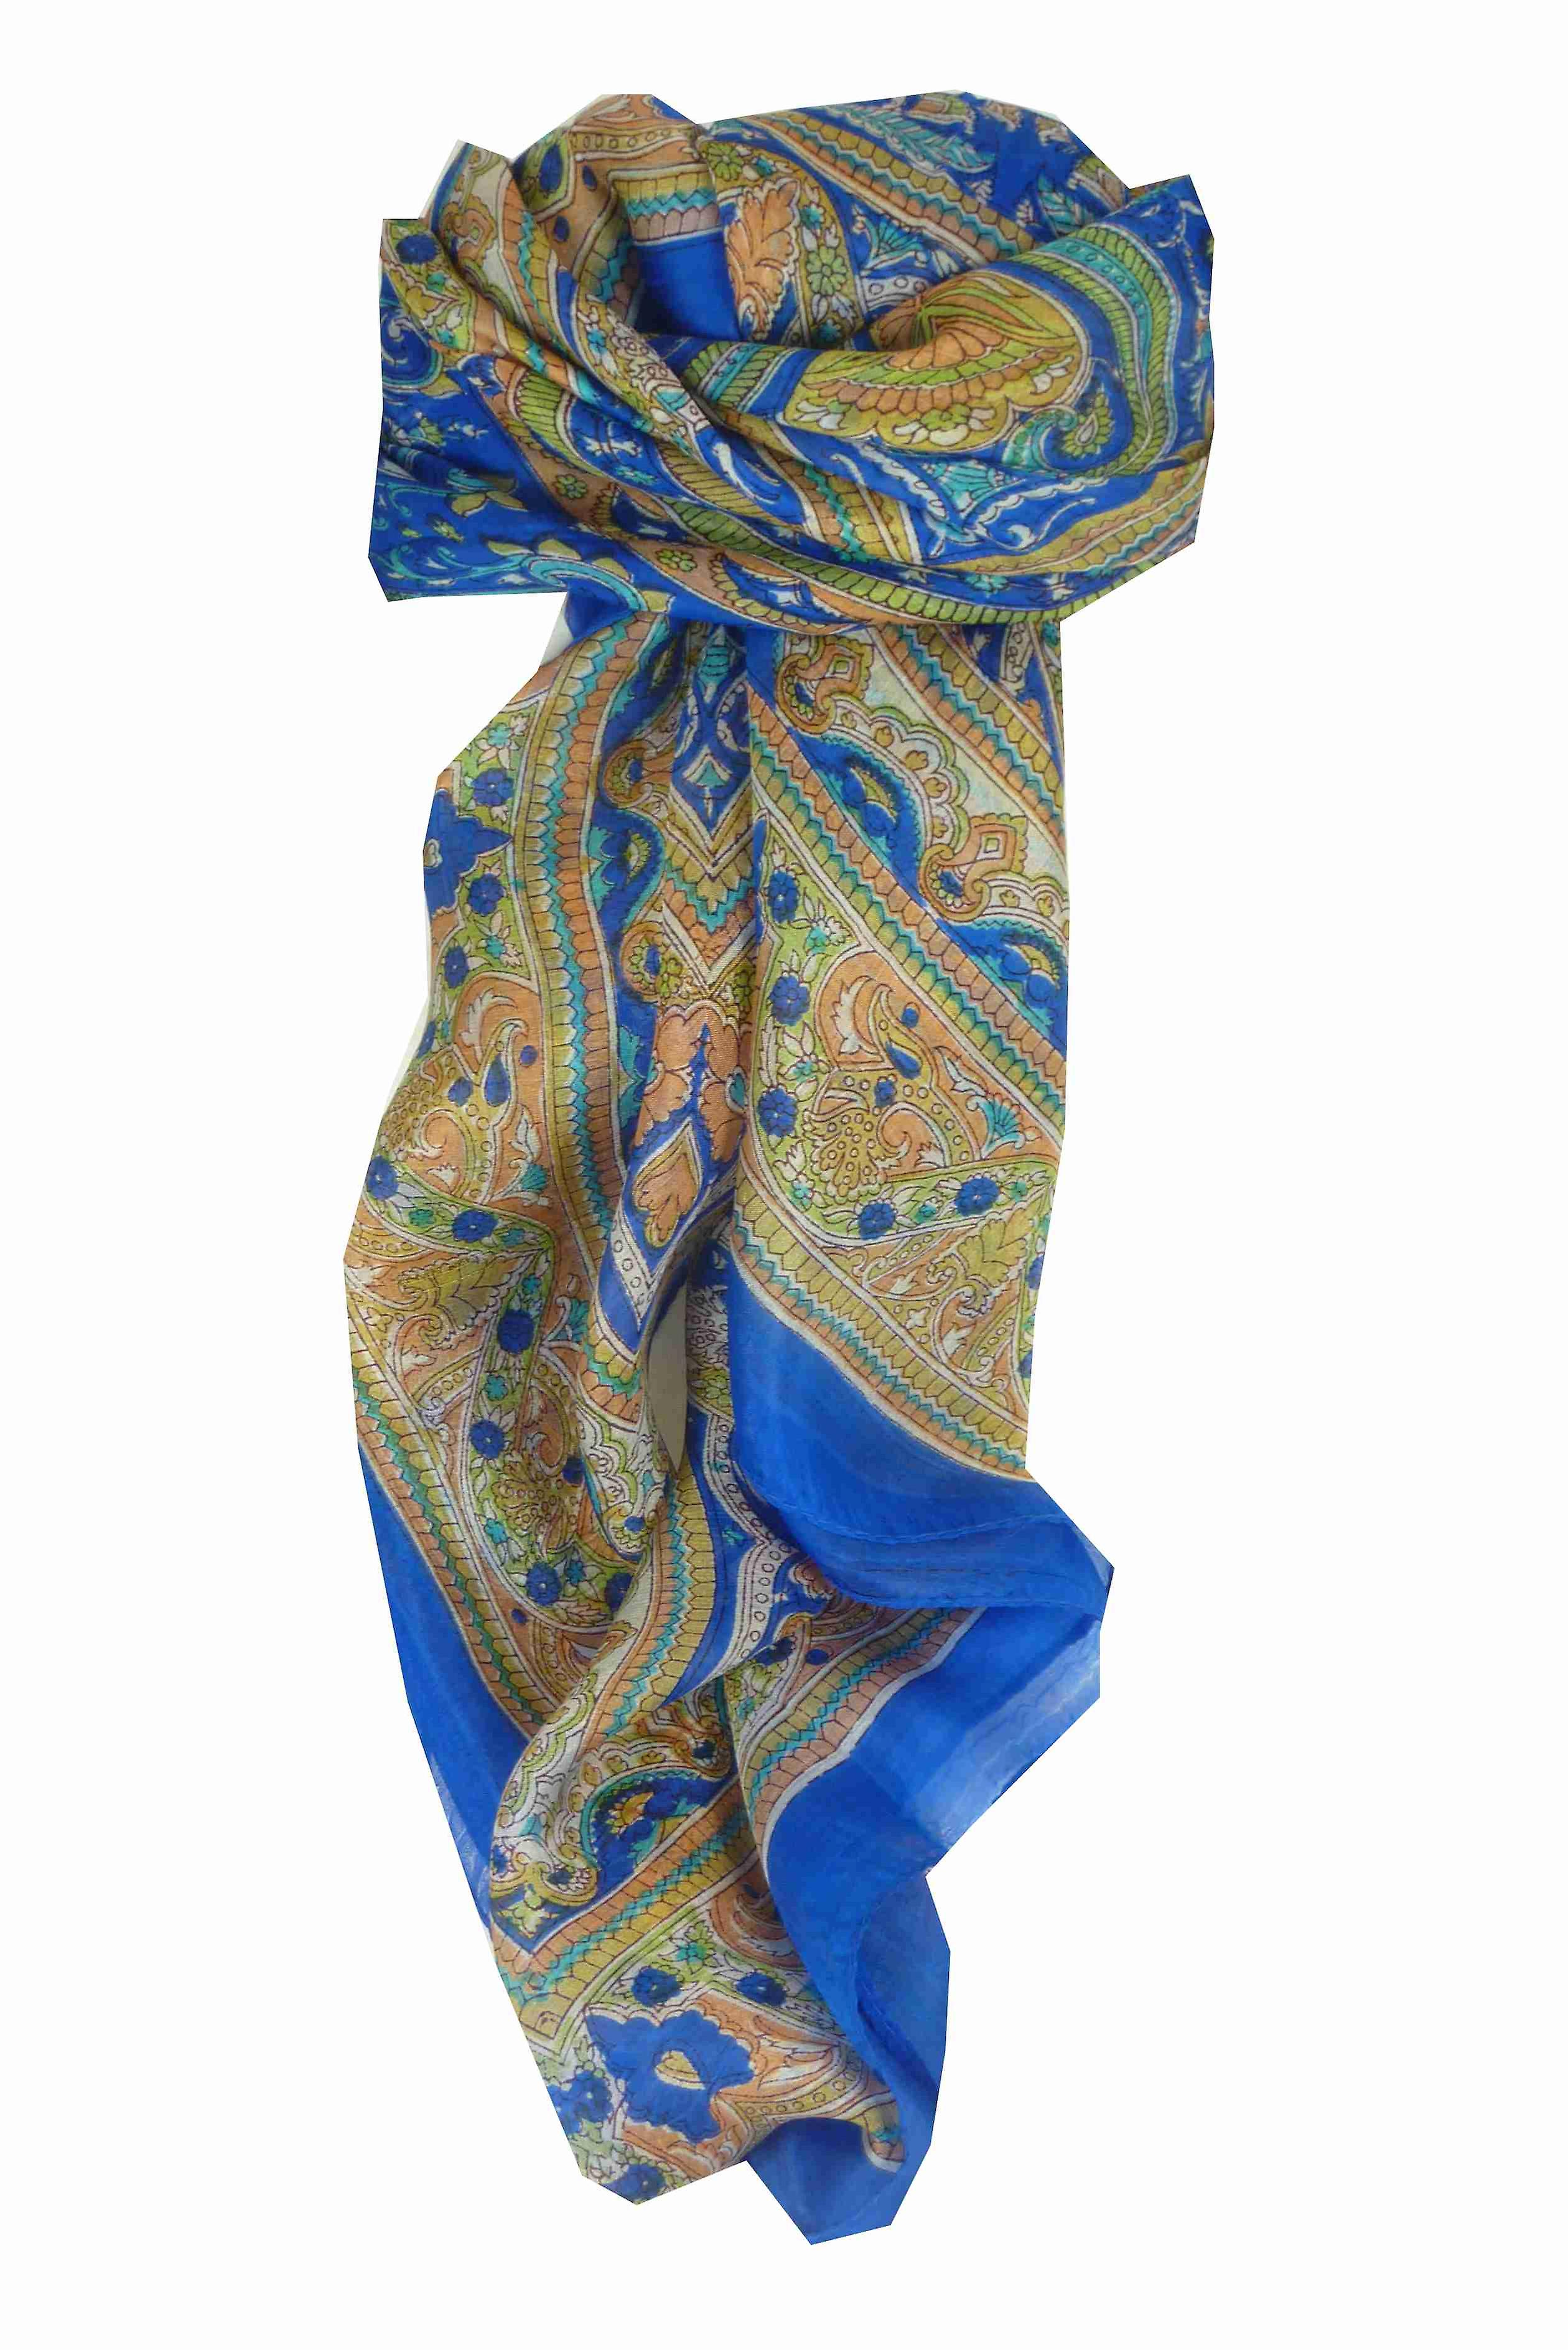 Mulberry Silk Traditional Square Scarf Gandak Blue by Pashmina & Silk